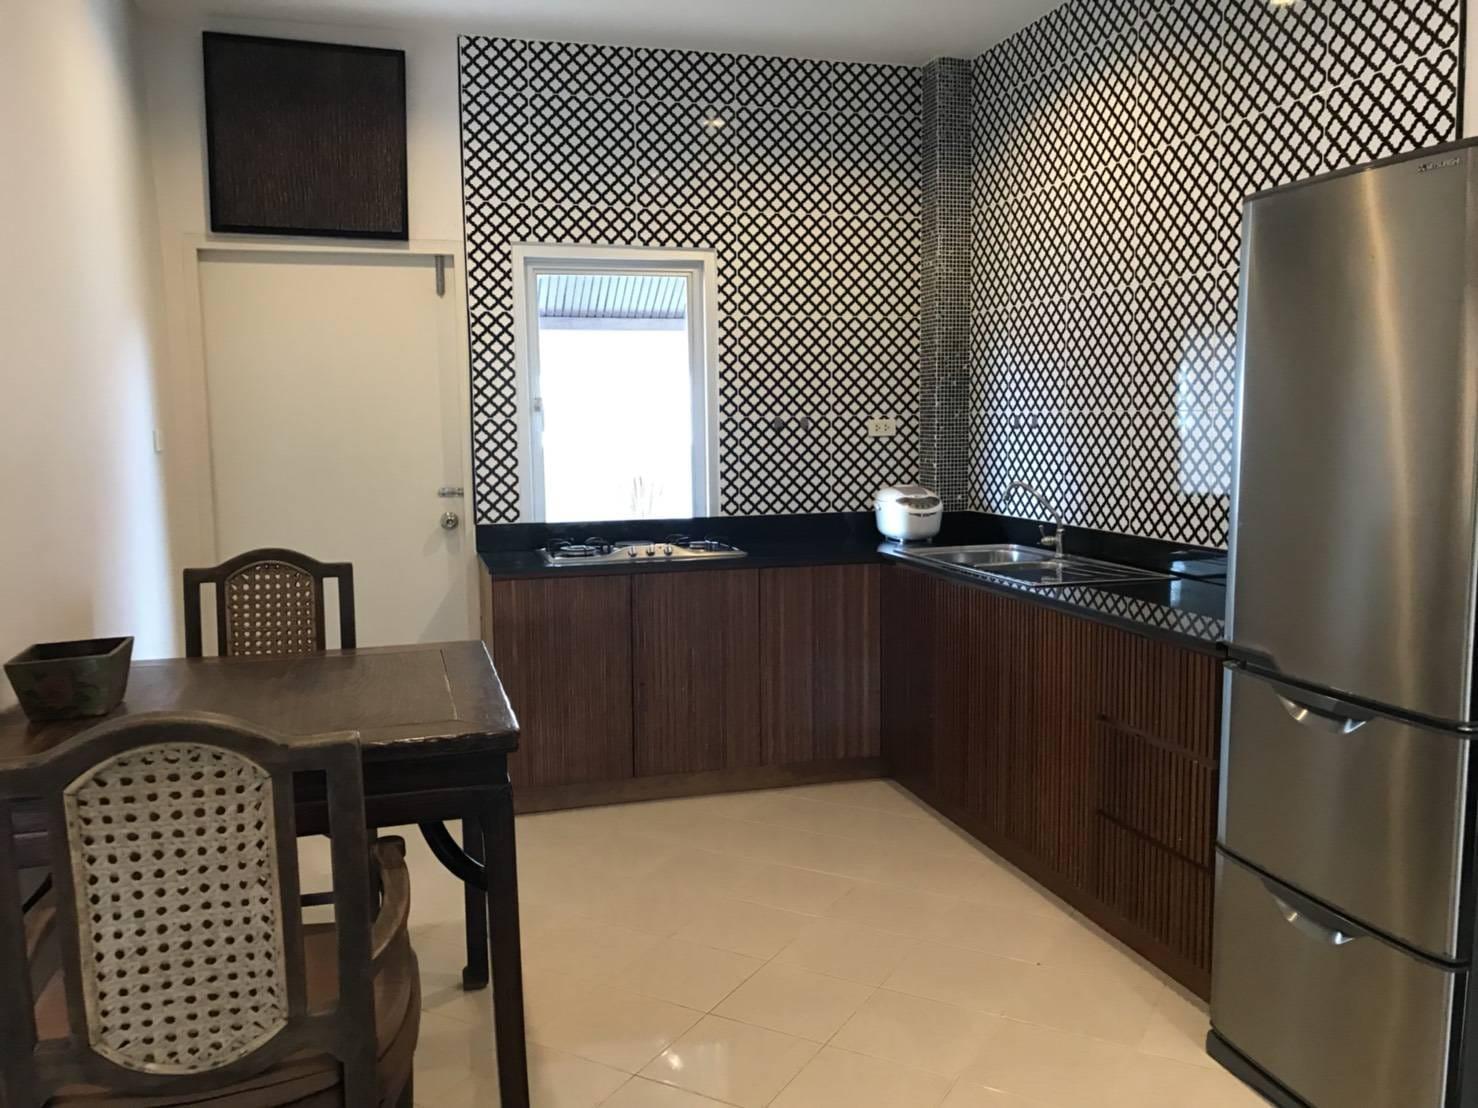 Cherng Talay 2 Bedroom -d8e20ce9-fa13-4509-b439-237dea5d5d1b.jpg